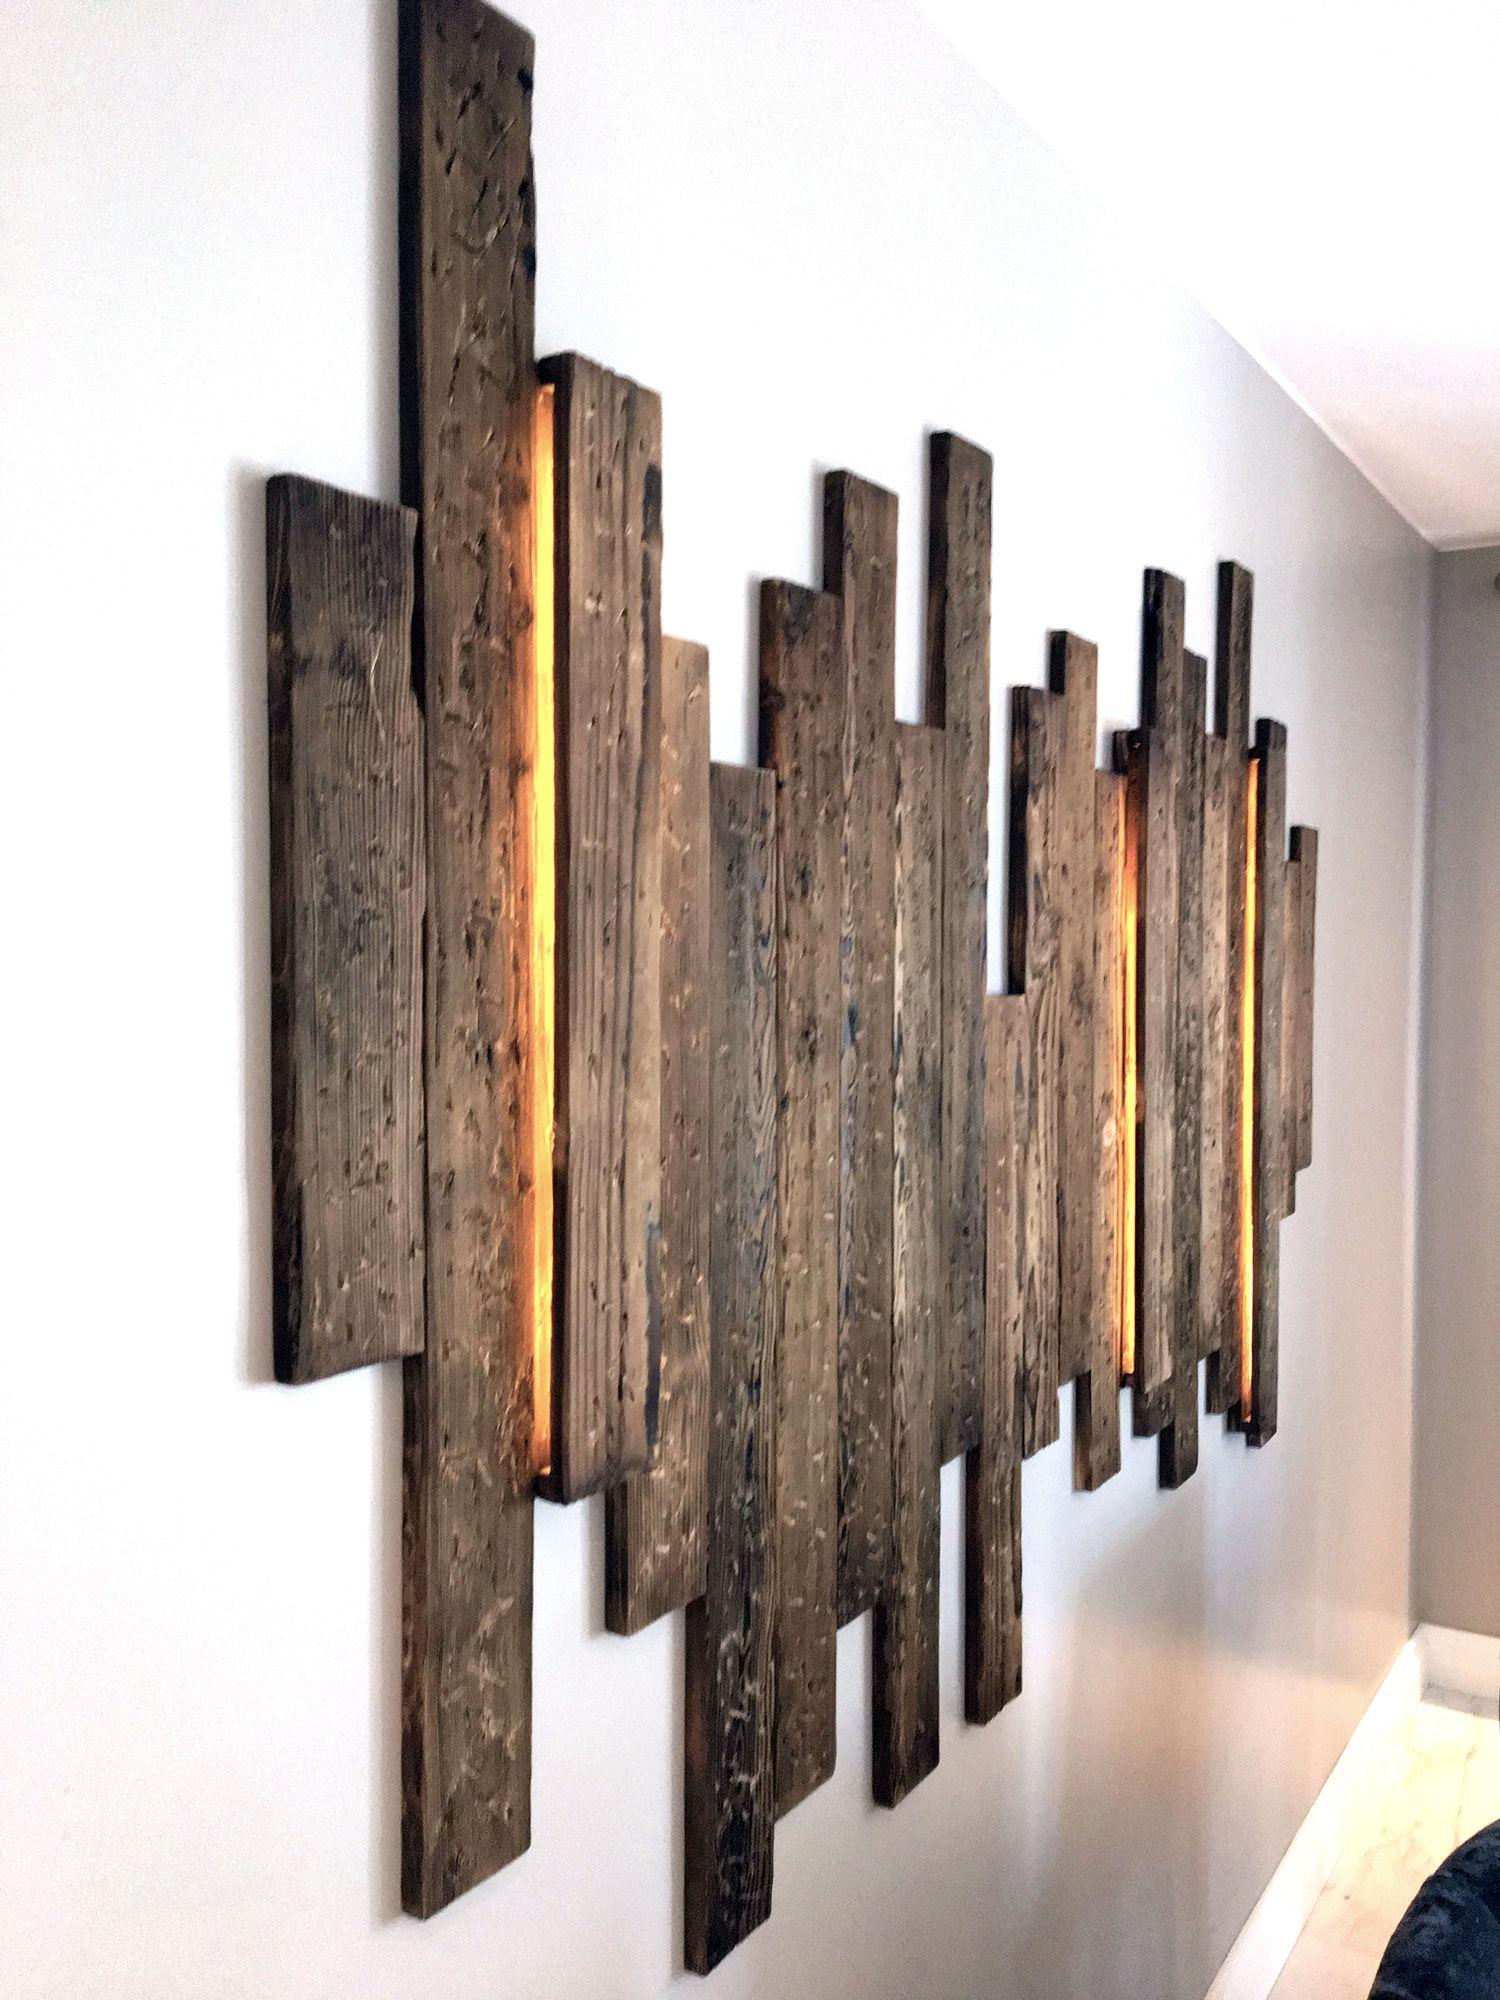 Pin Von Natascha Wurst Auf Kuhltstube Wandgestaltung Ideen Rustikale Lampen Holzwand